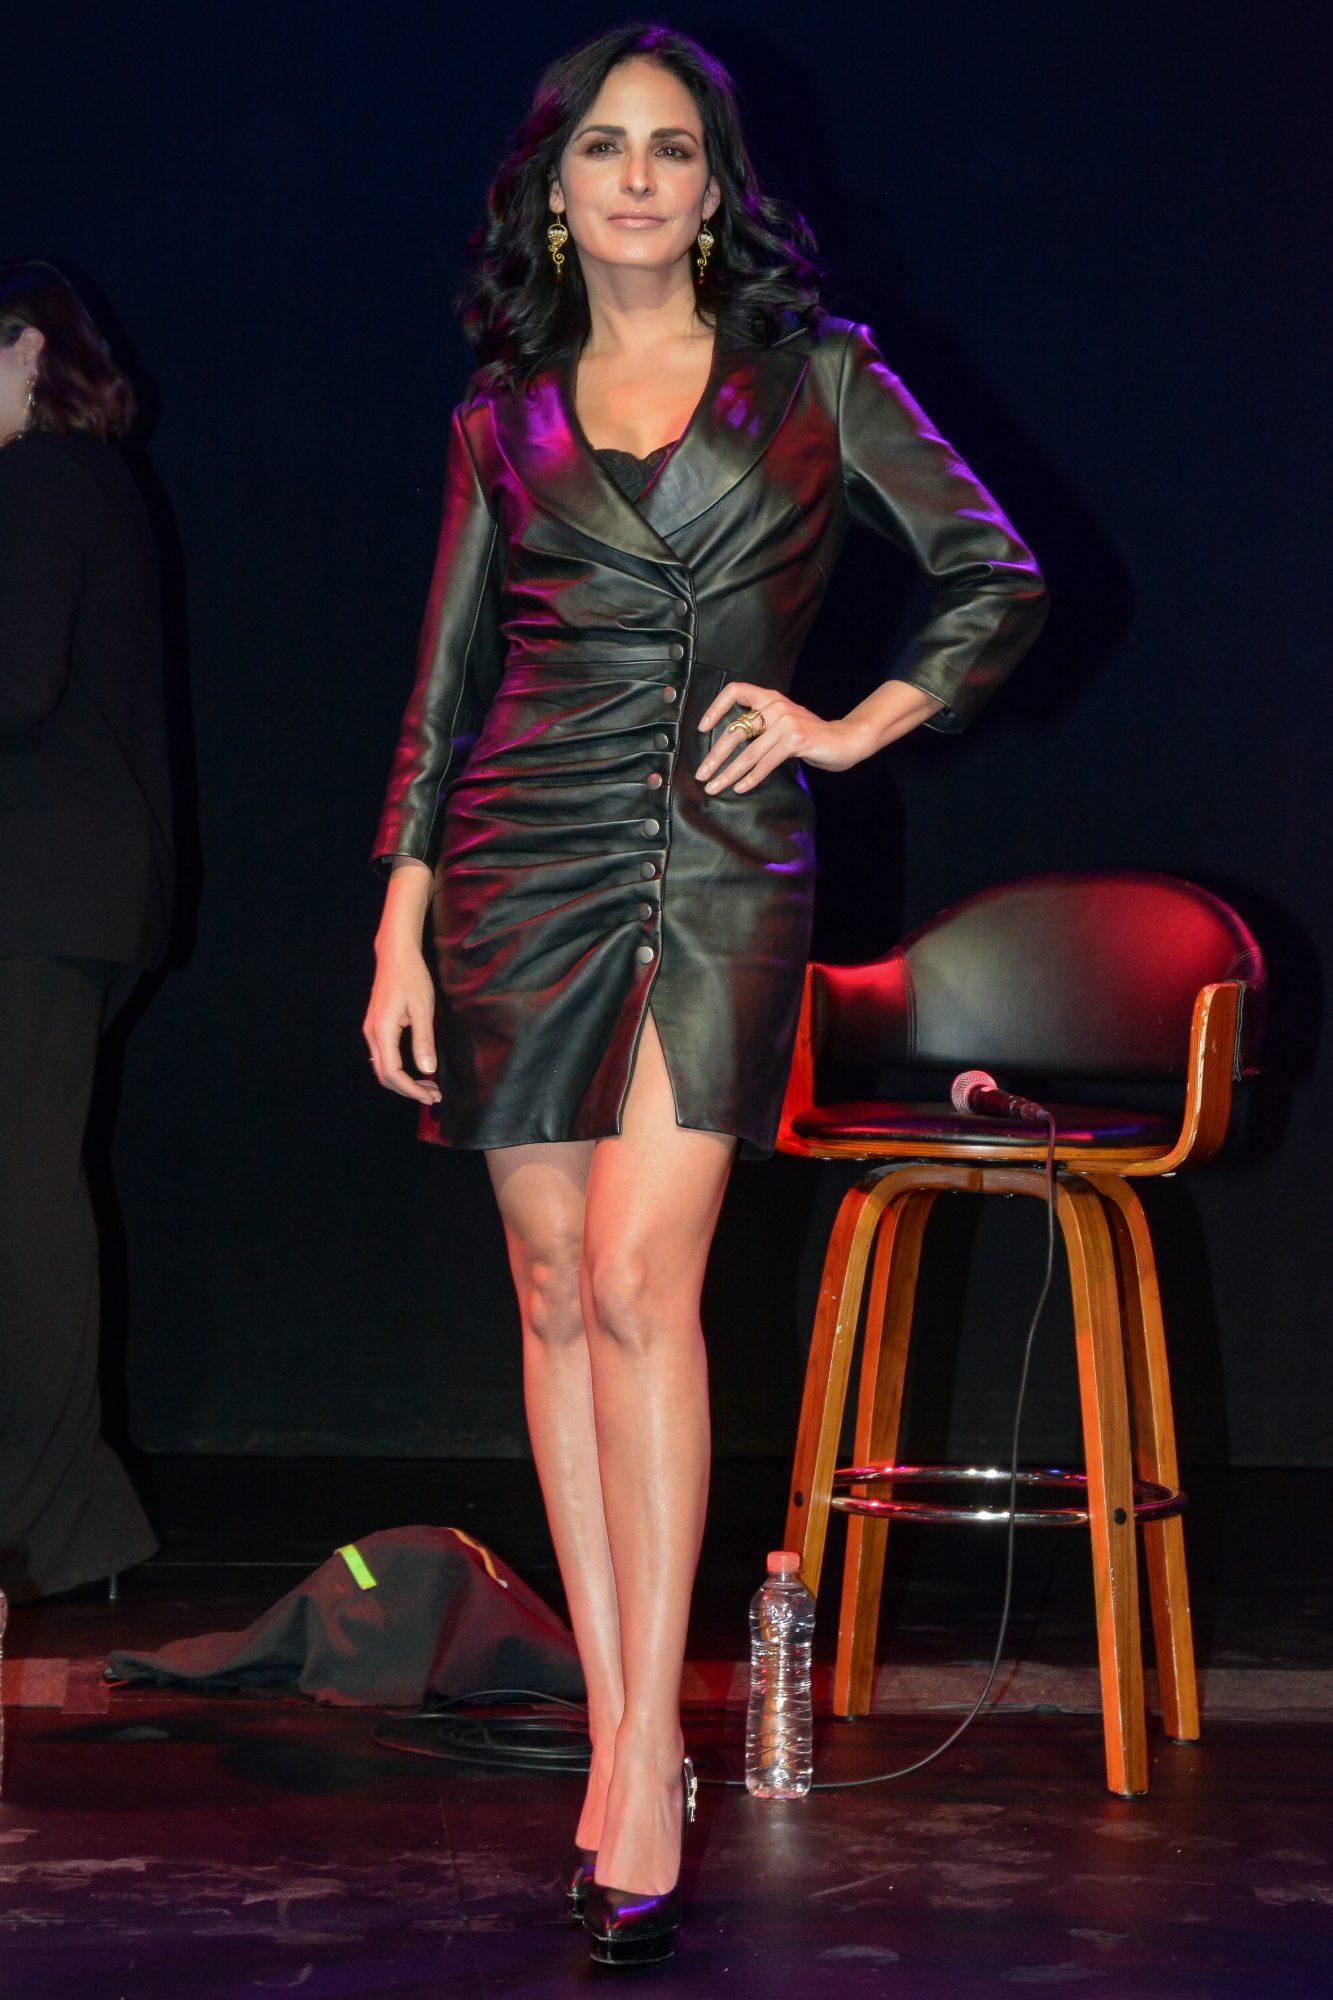 Ximena Herrera, looks